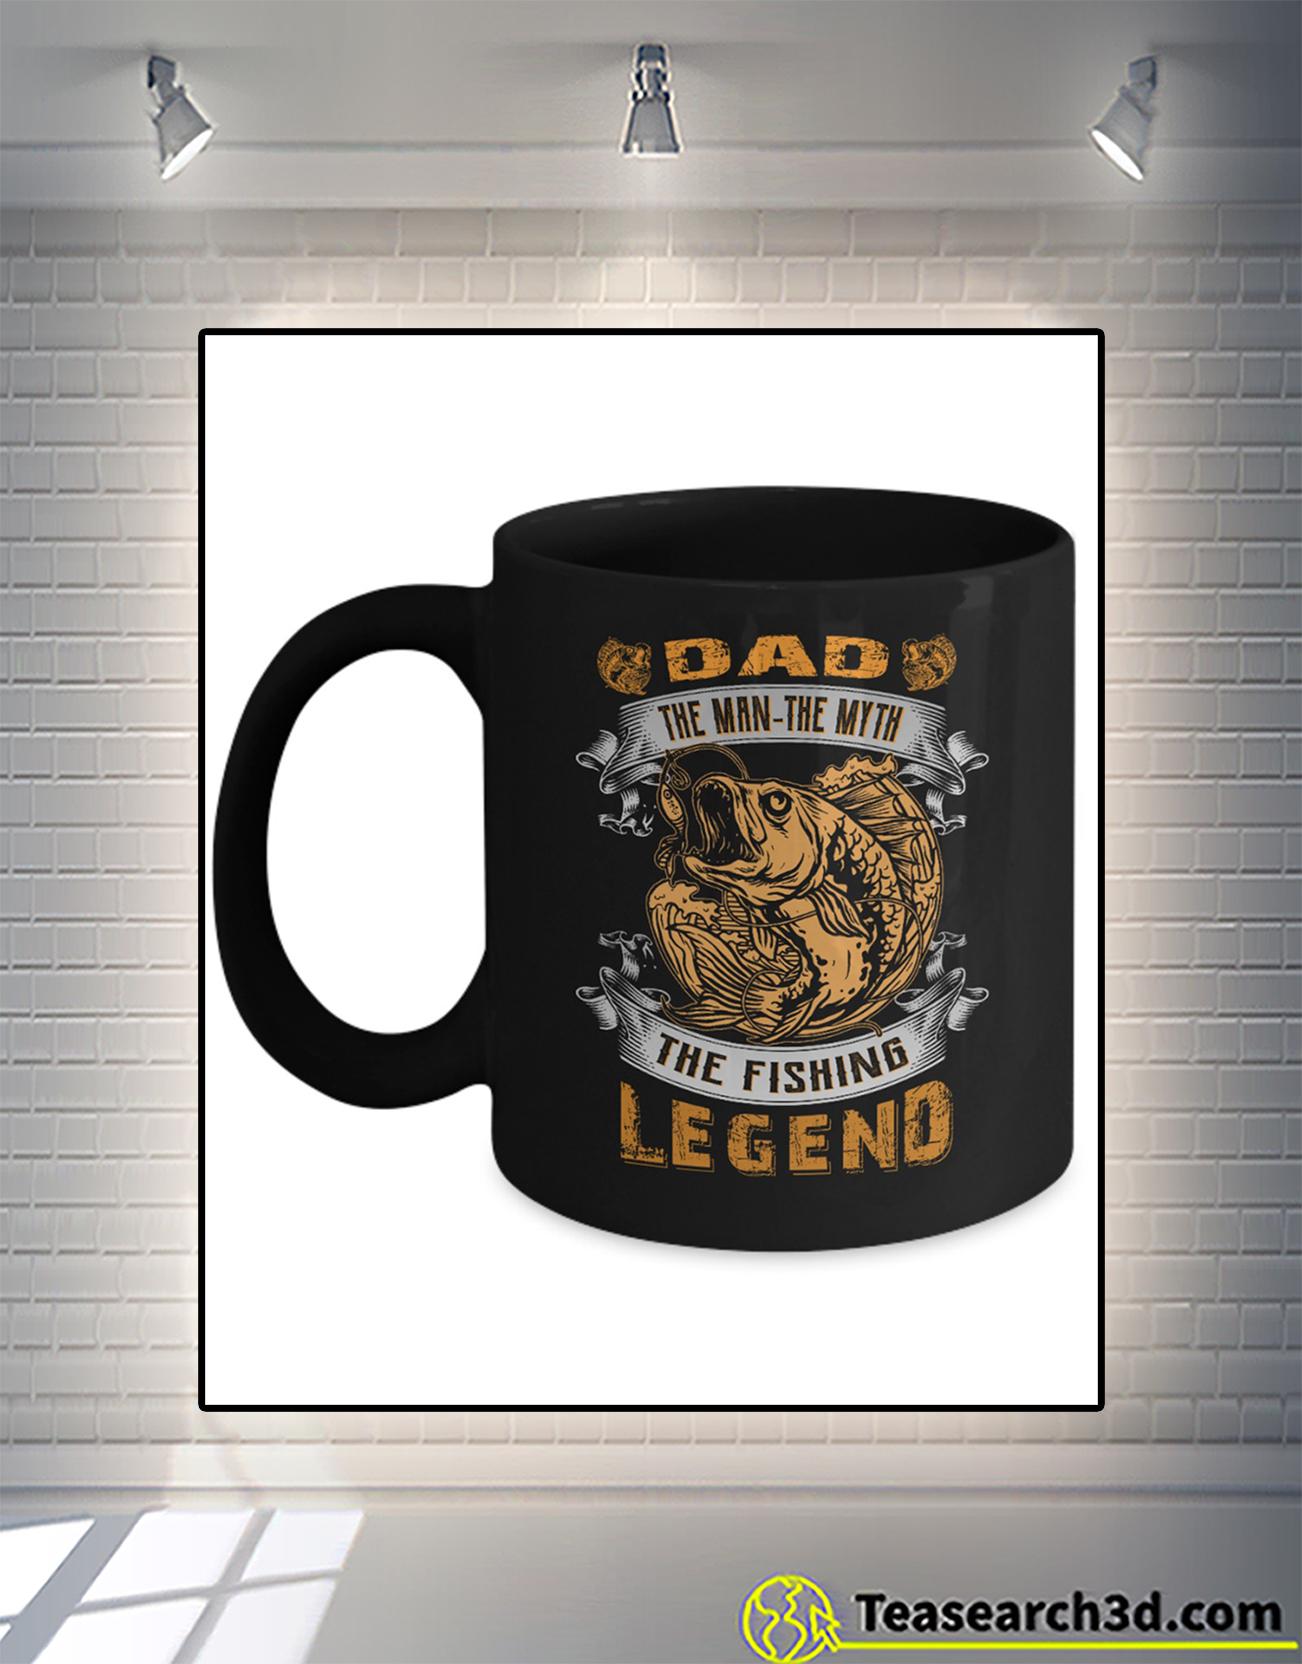 Dad the man the myth the fishing legend mug 2